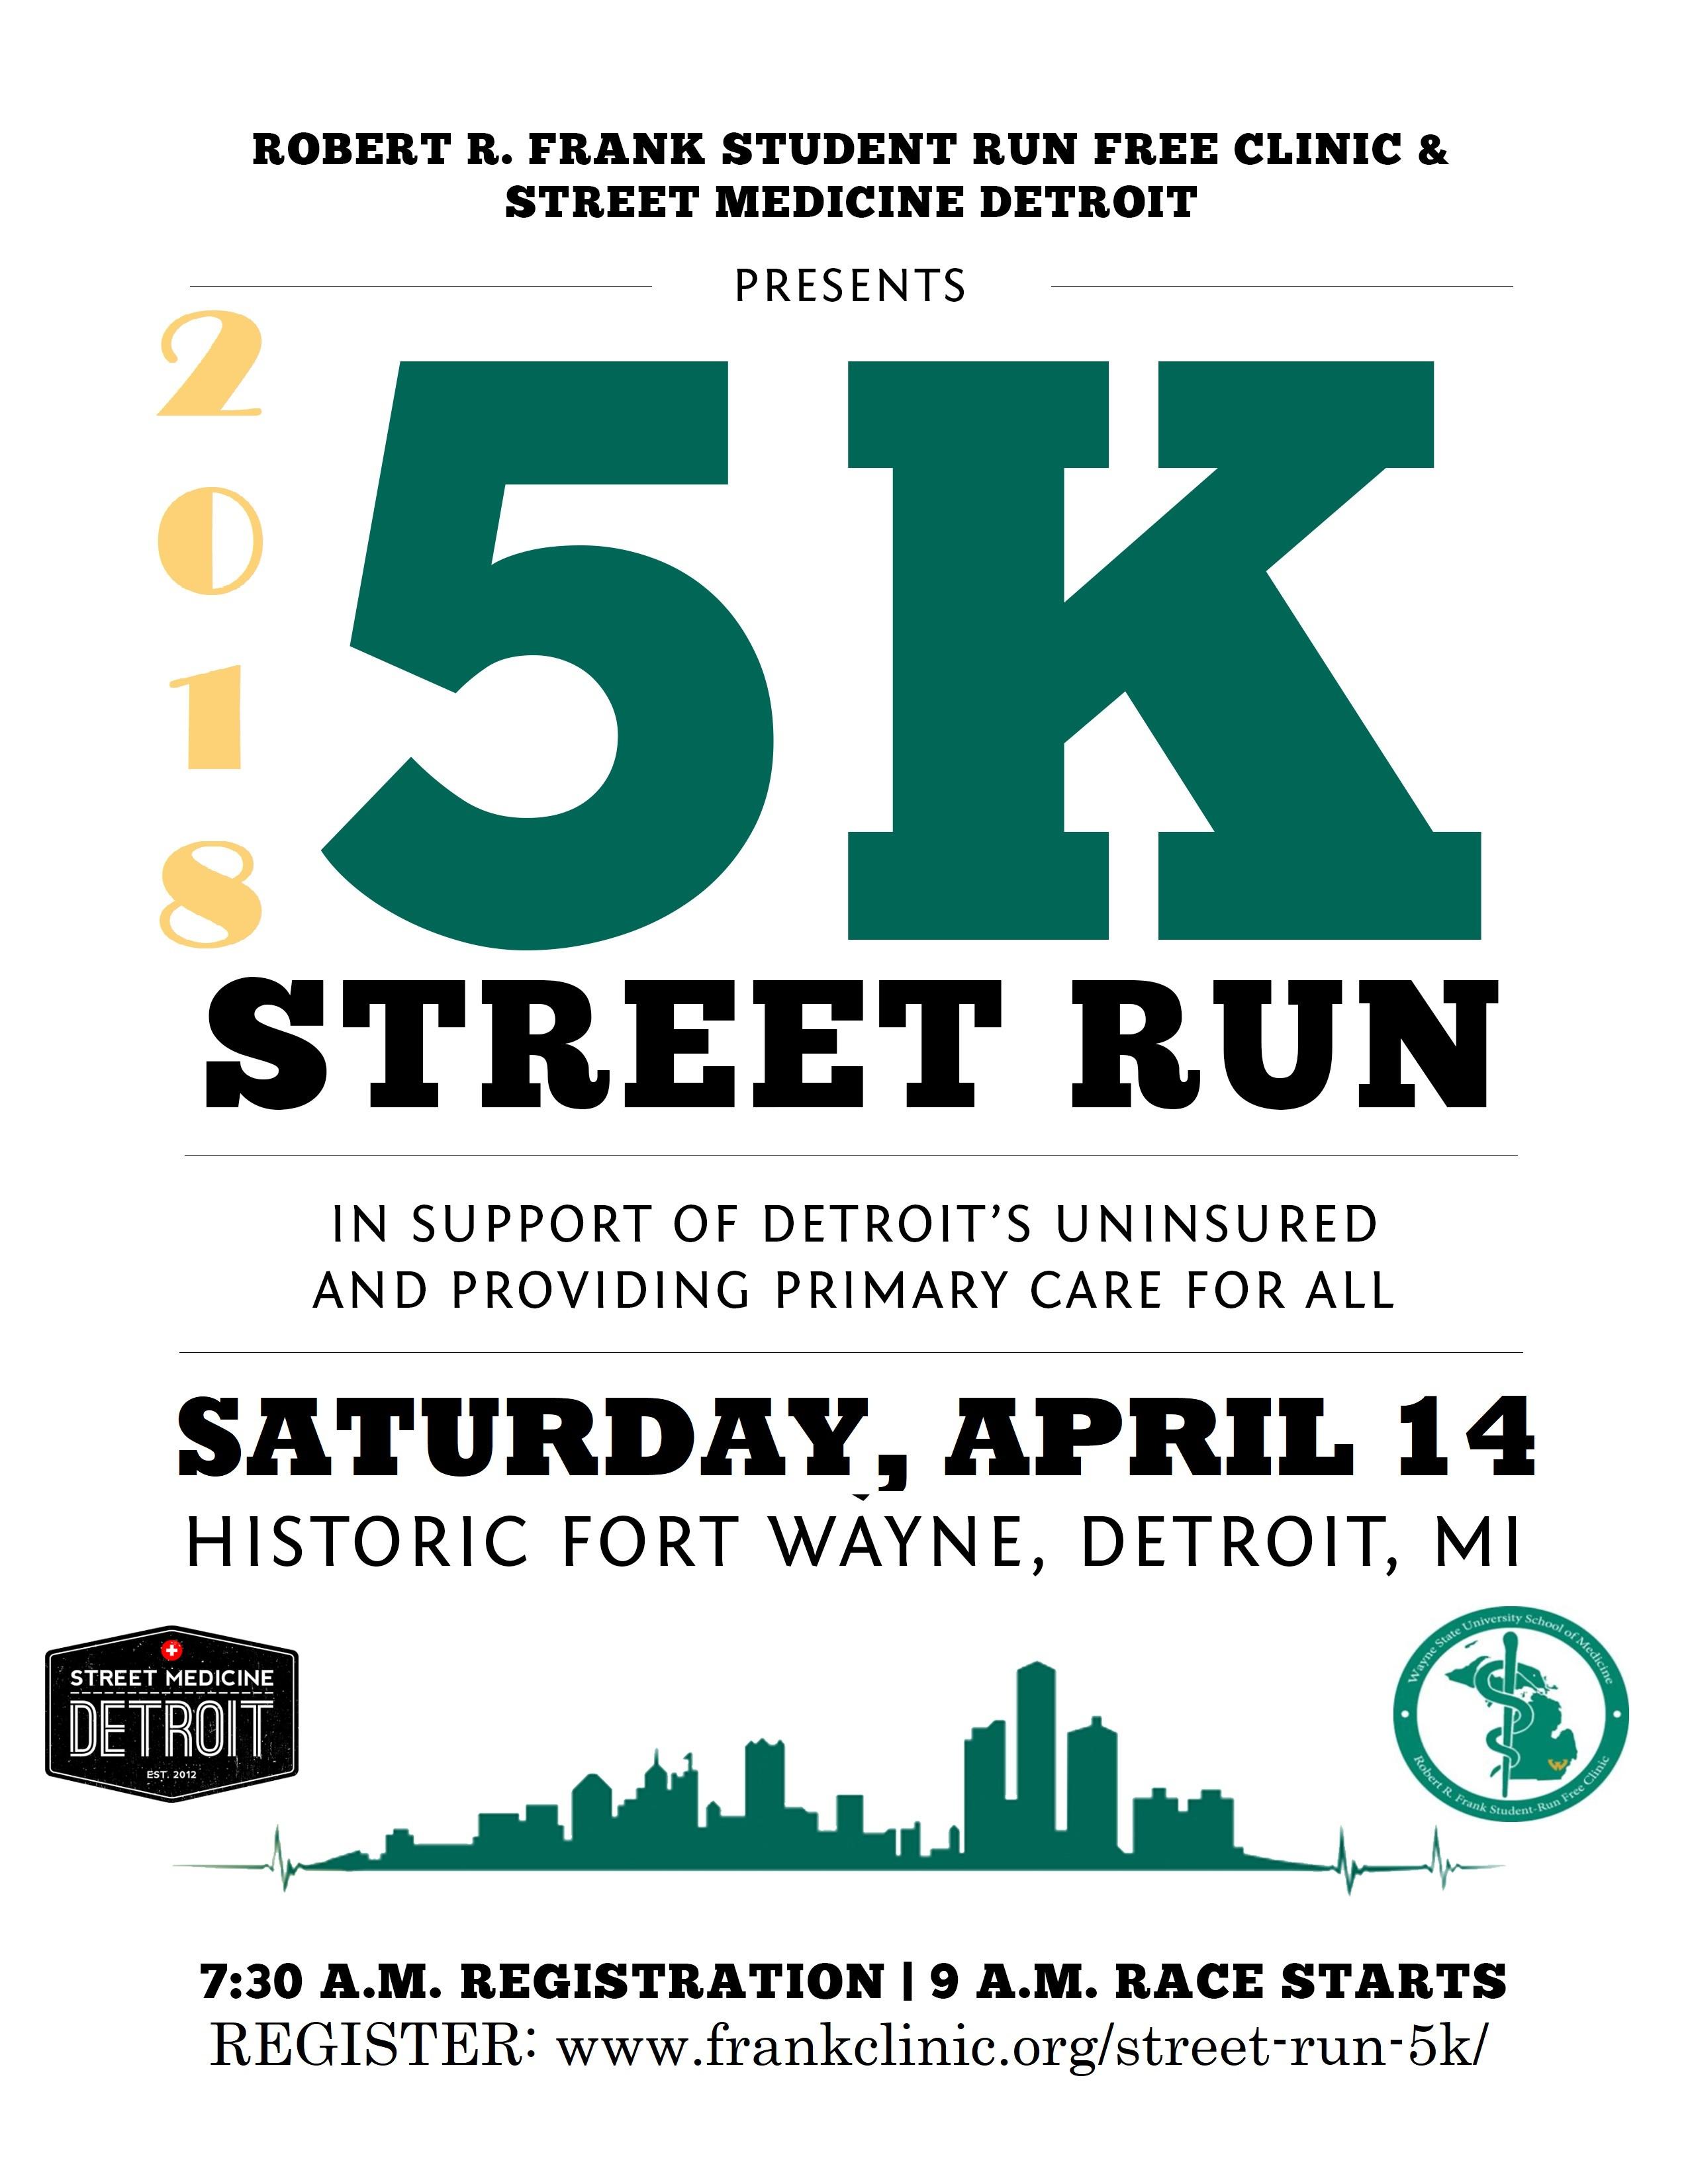 April 14 5K run/walk benefits Student-Run Free Clinic and Street Medicine Detroit